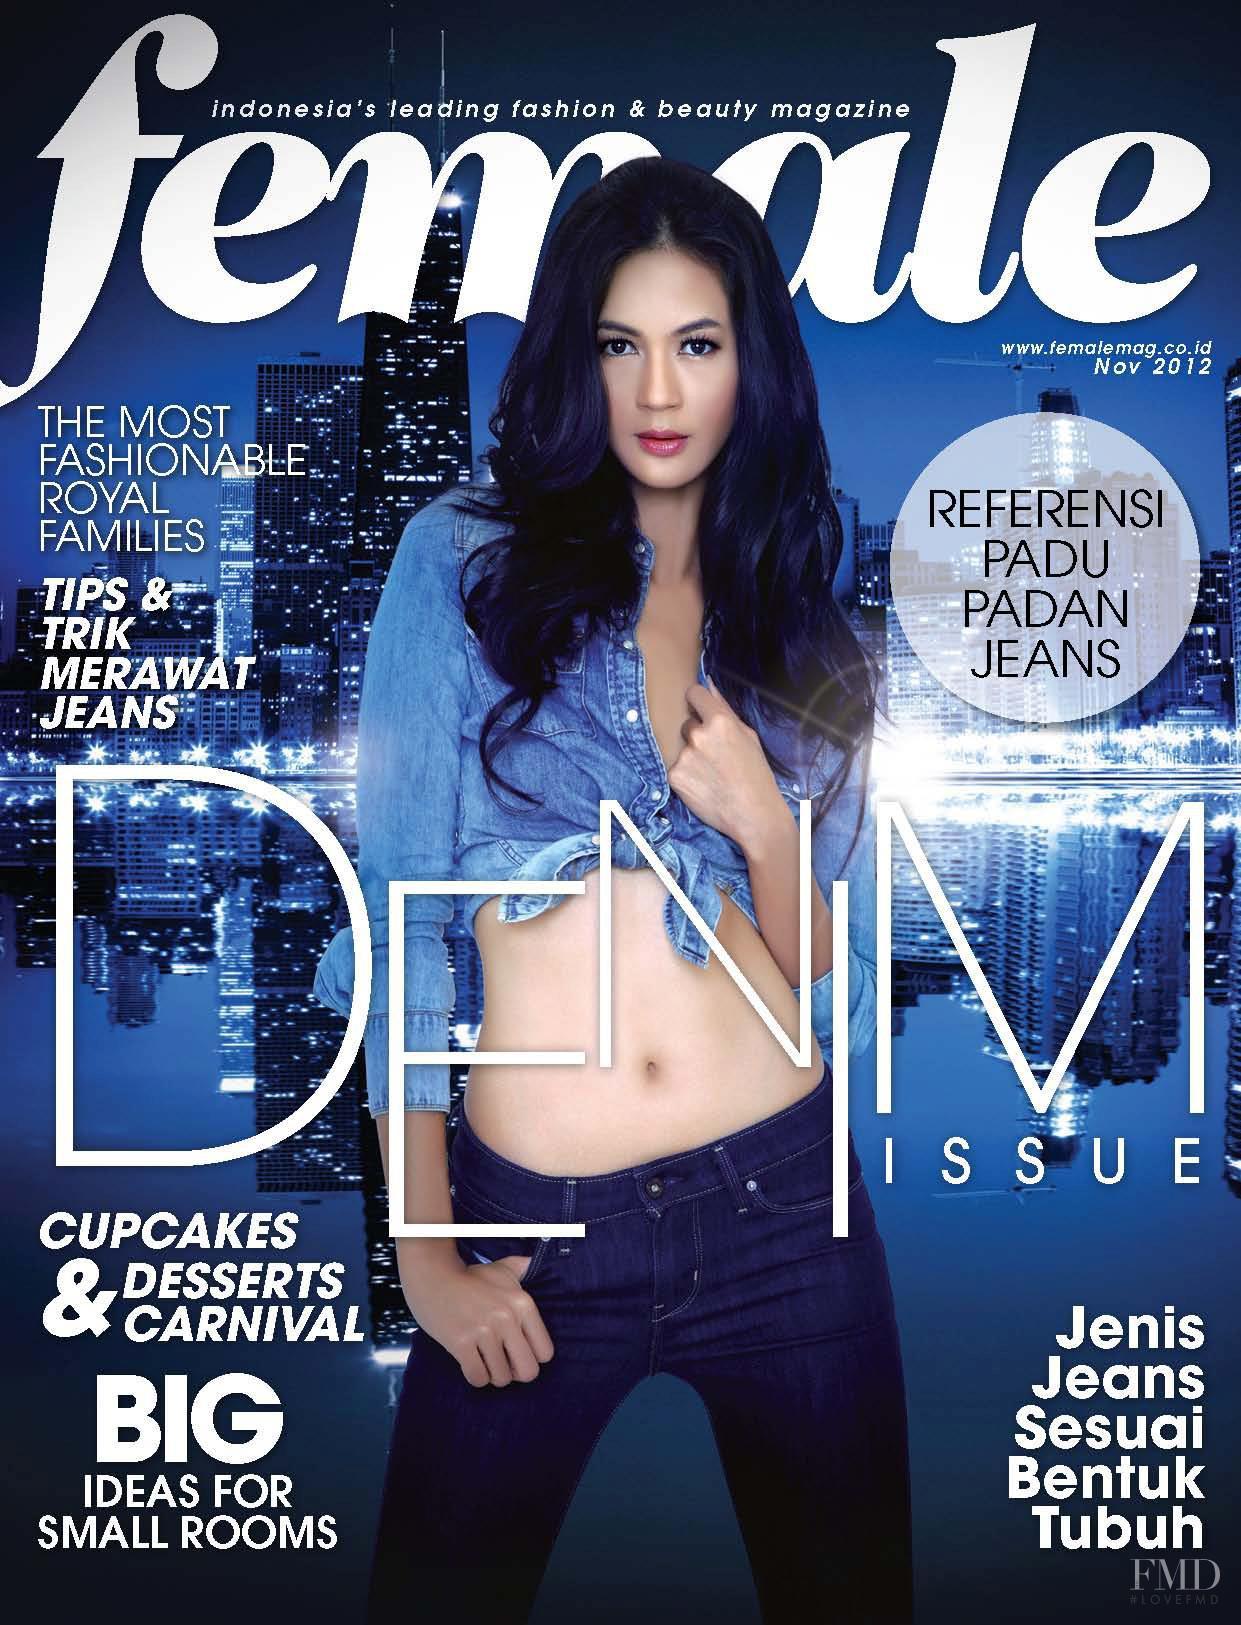 Female magazine indonesia